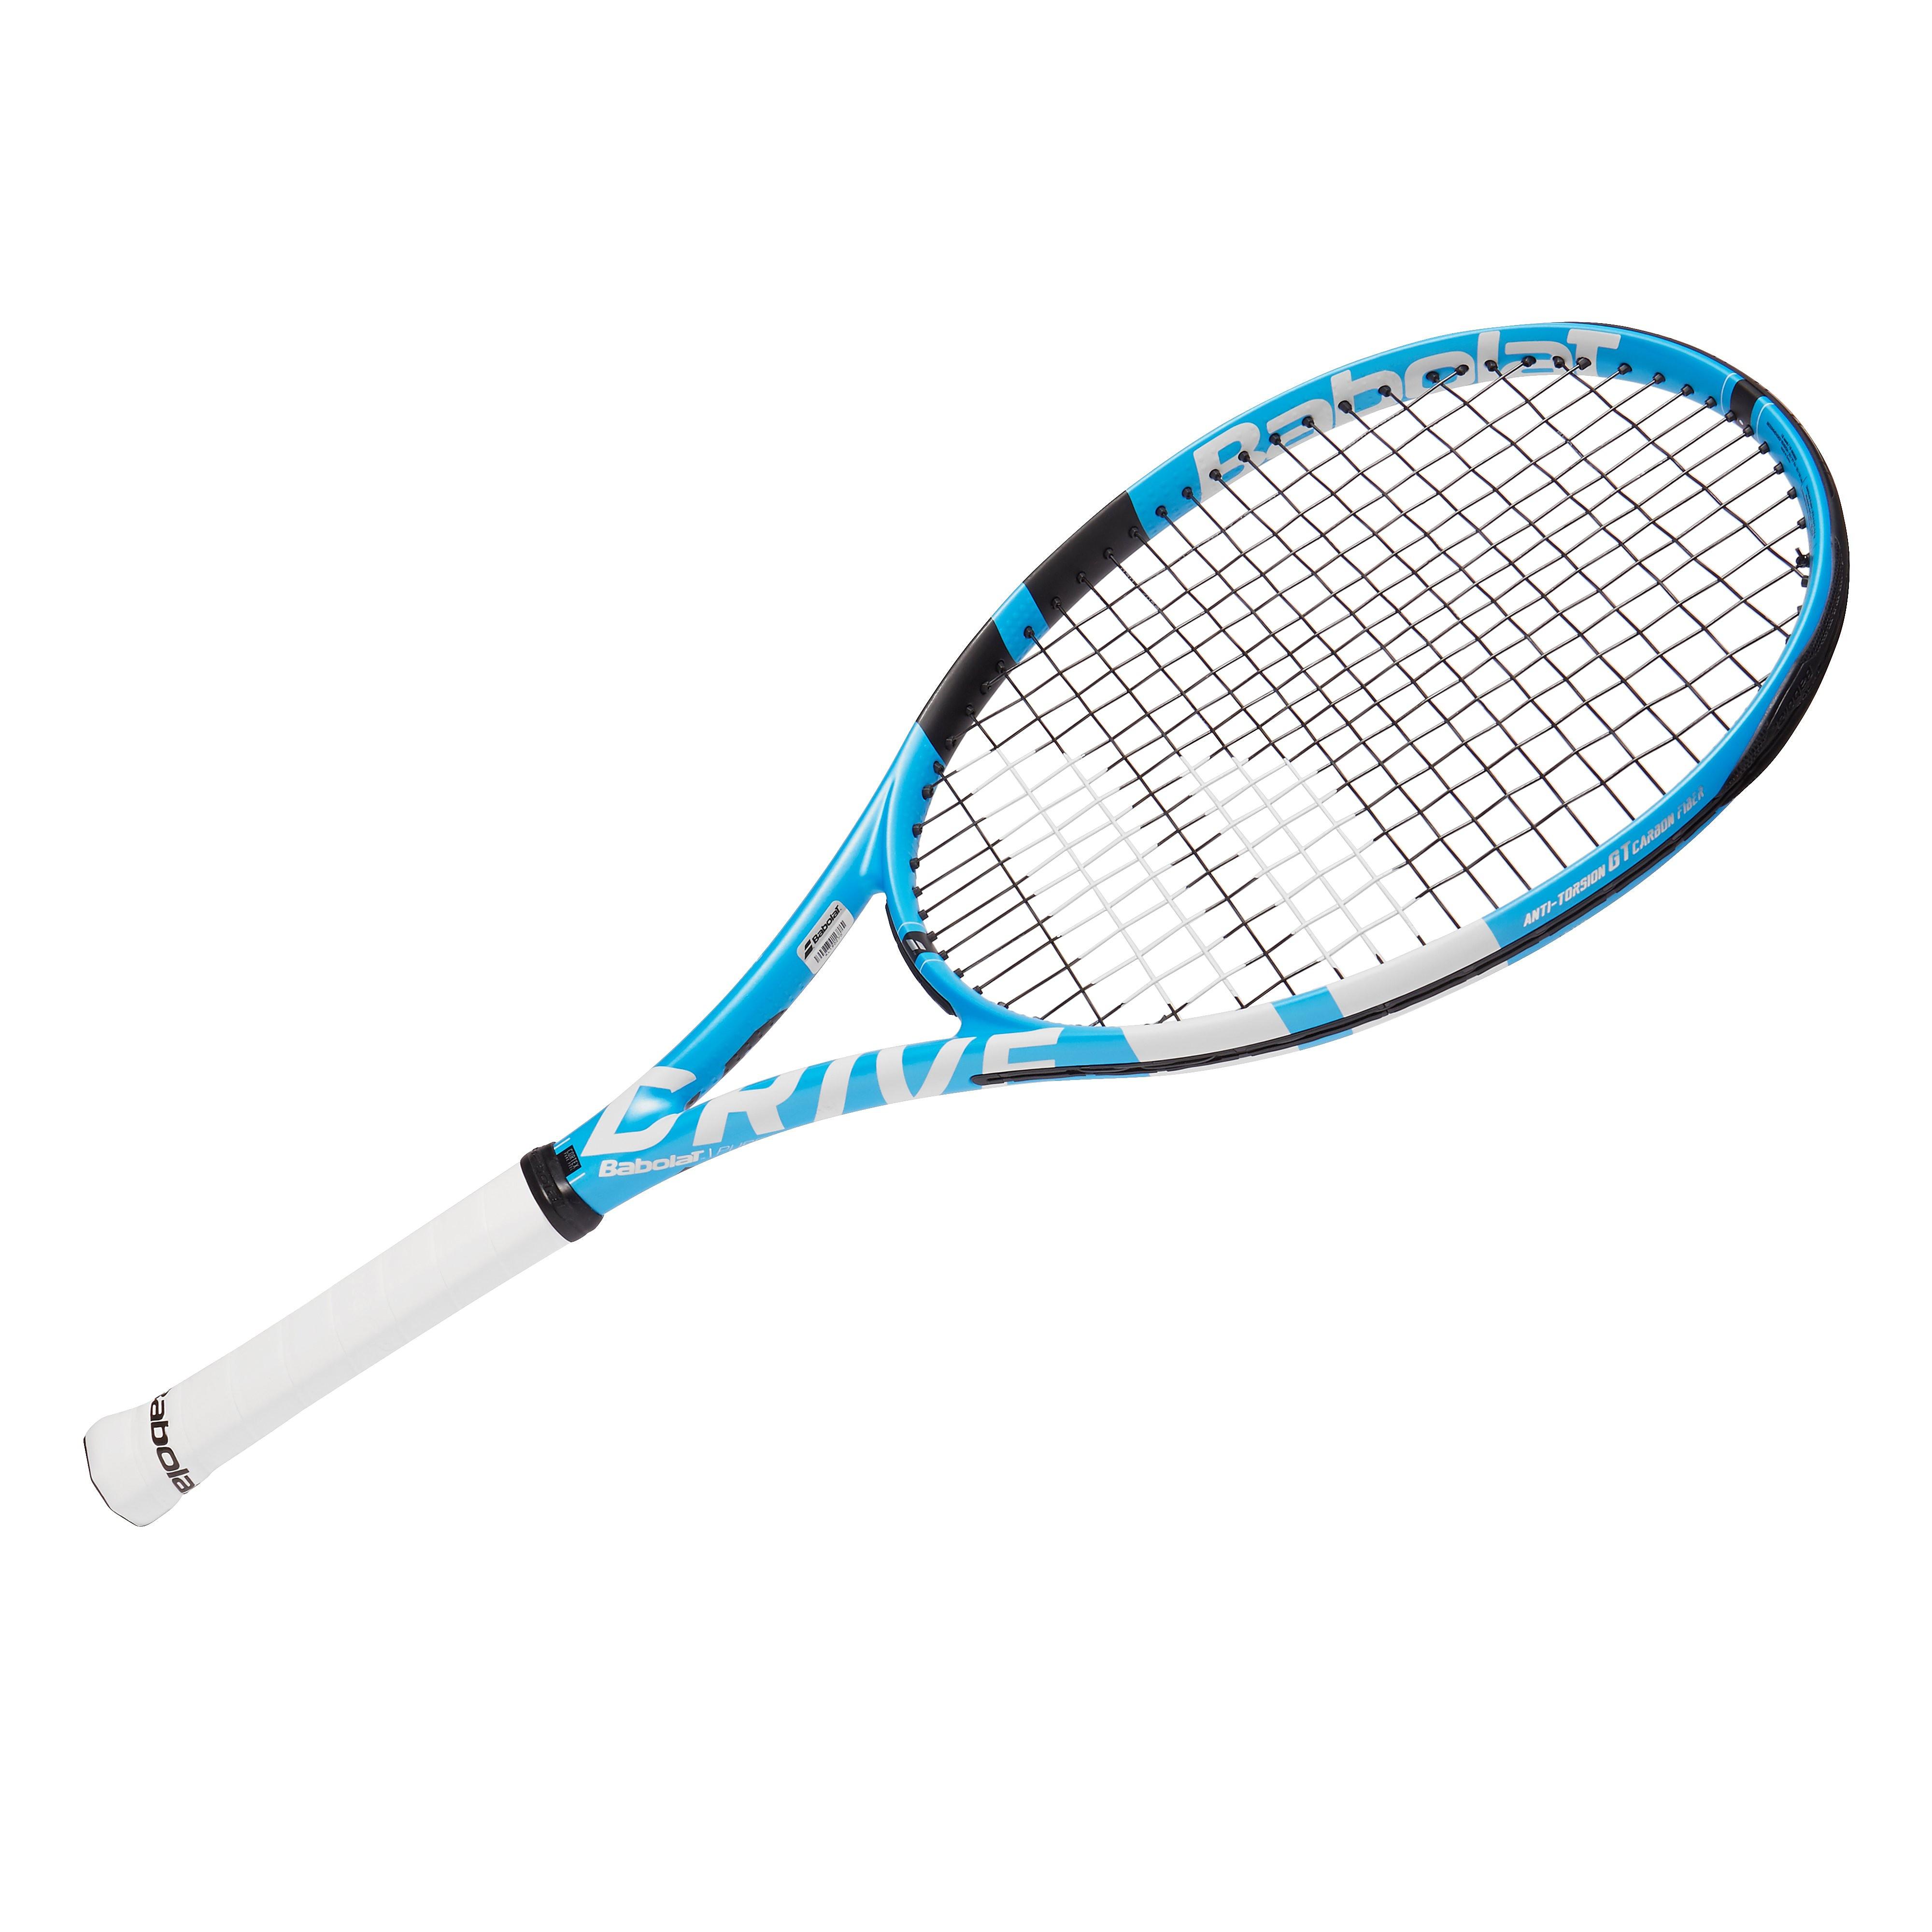 Babolat Pure Drive Lite Tennis Racket